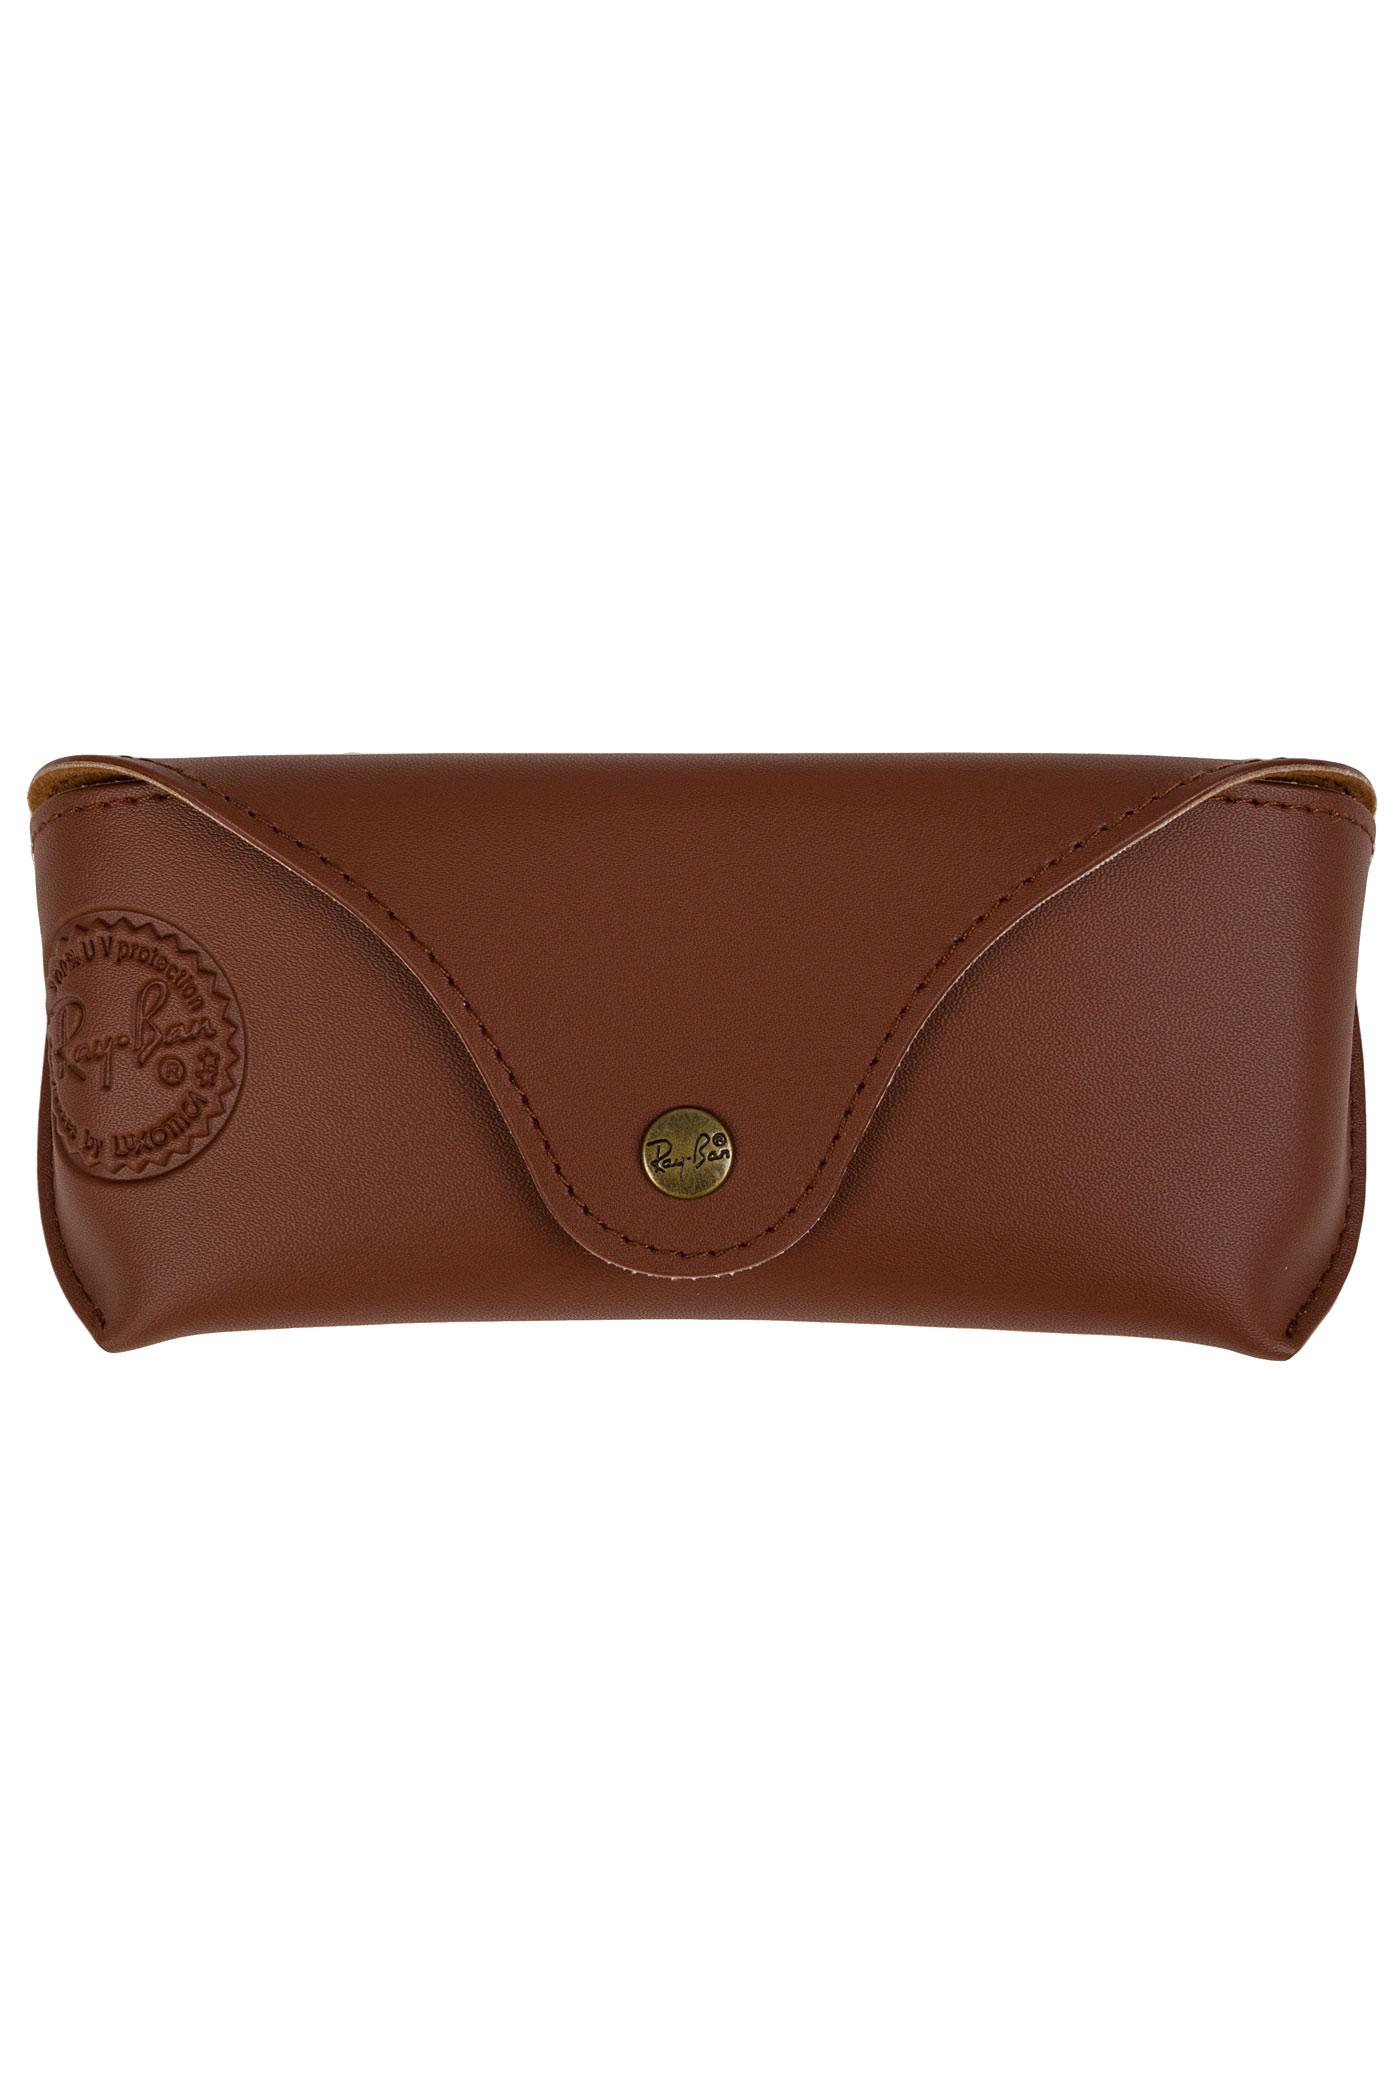 9a1ea38dbb Ray Ban Round Craft Leather « Heritage Malta